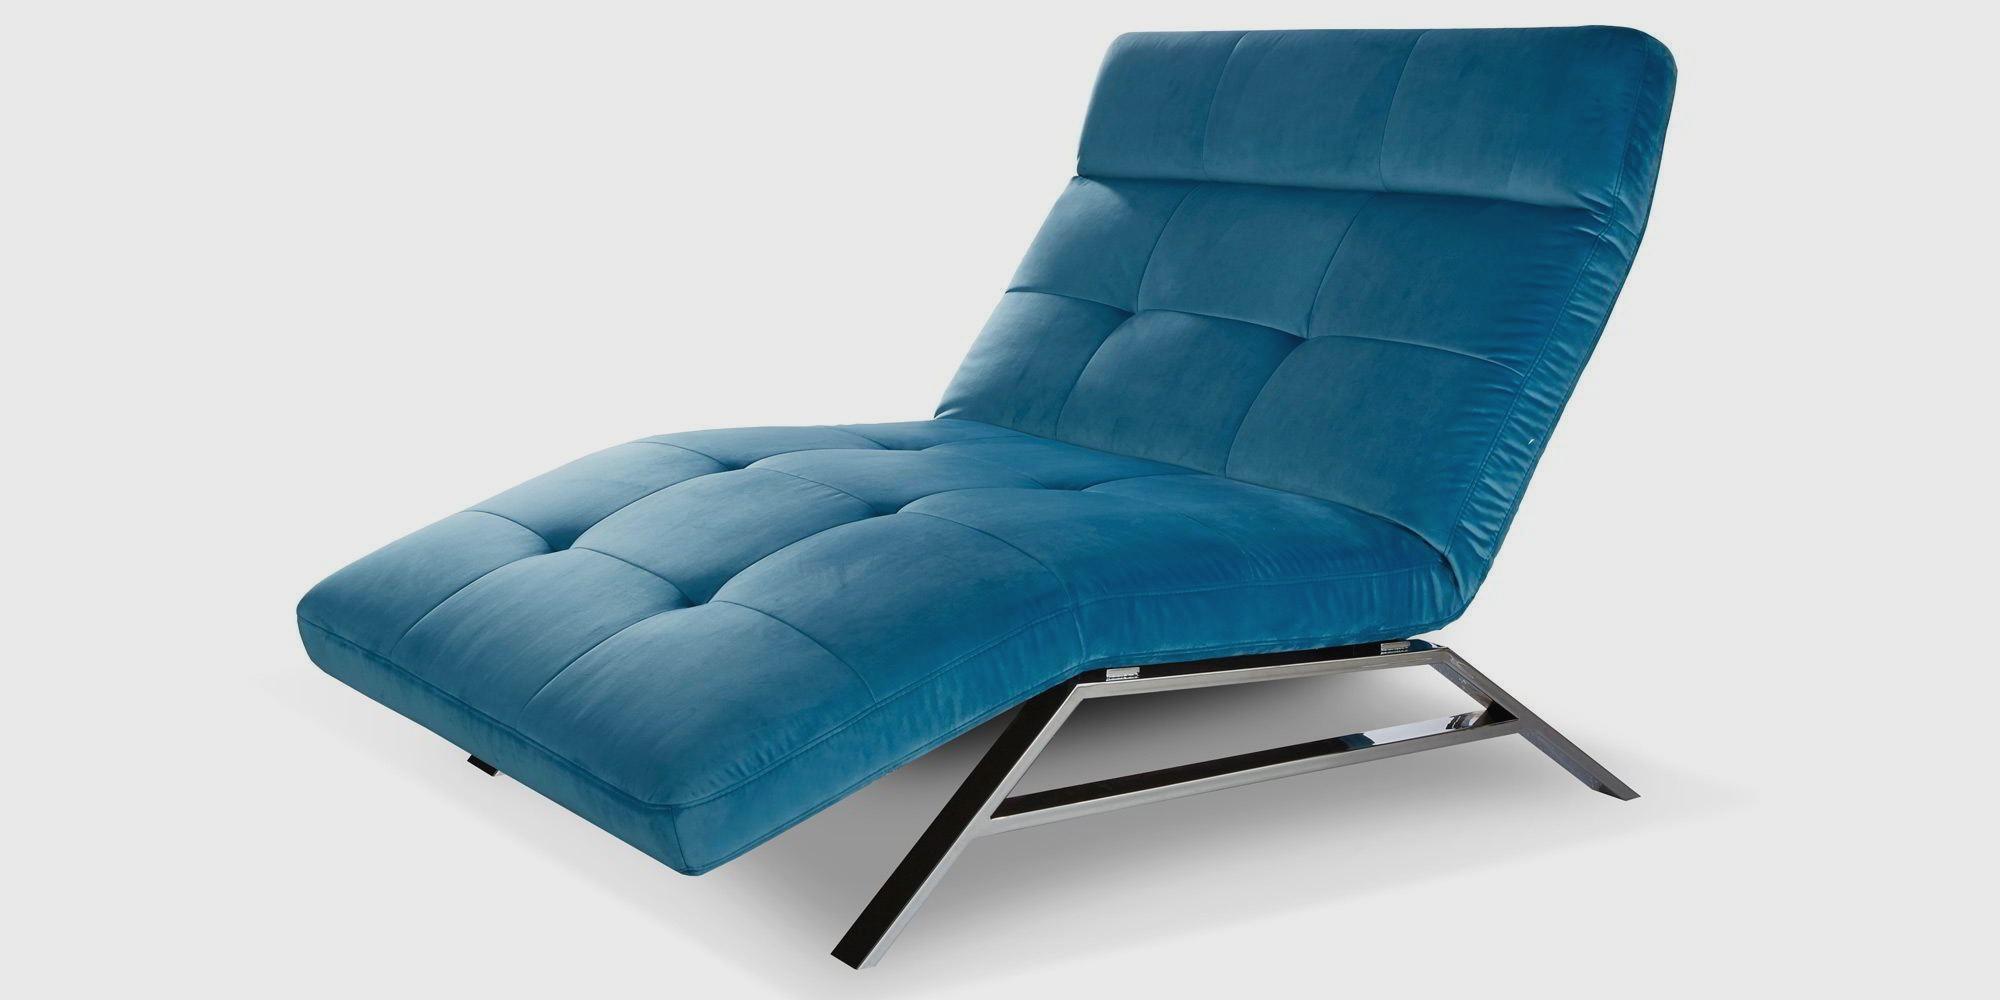 Full Size of Wohnzimmer Liegestuhl Ikea Relax Designer Rattan Liege Chill Aluminium Lounge Metall Garten Fototapeten Bilder Fürs Moderne Deckenleuchte Wandtattoo Wohnzimmer Wohnzimmer Liegestuhl